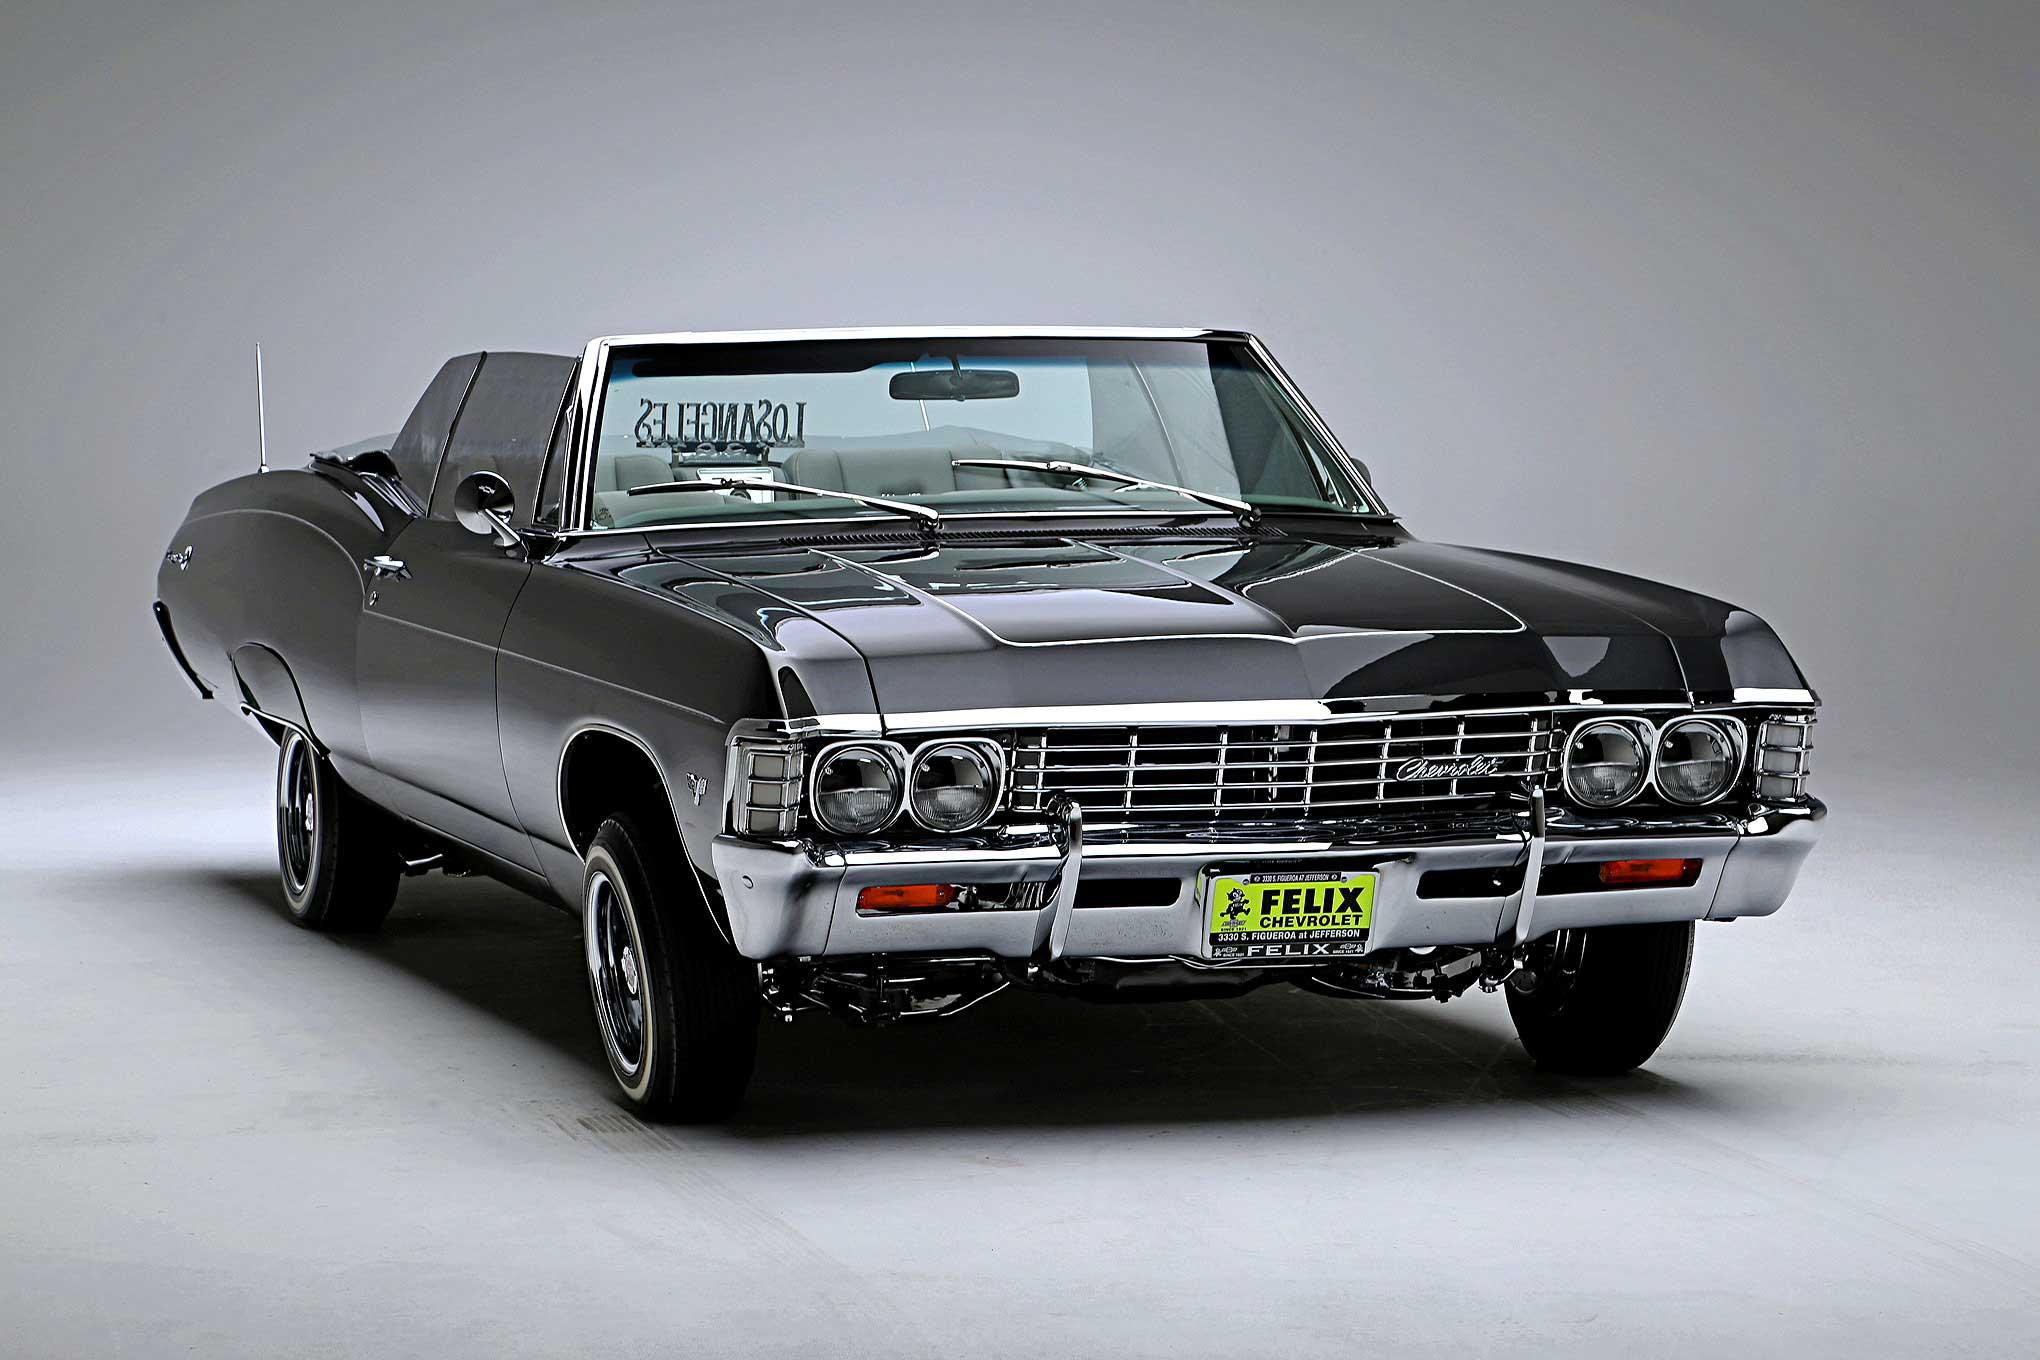 1967 chevrolet impala convertible a poor man 39 s dream. Black Bedroom Furniture Sets. Home Design Ideas